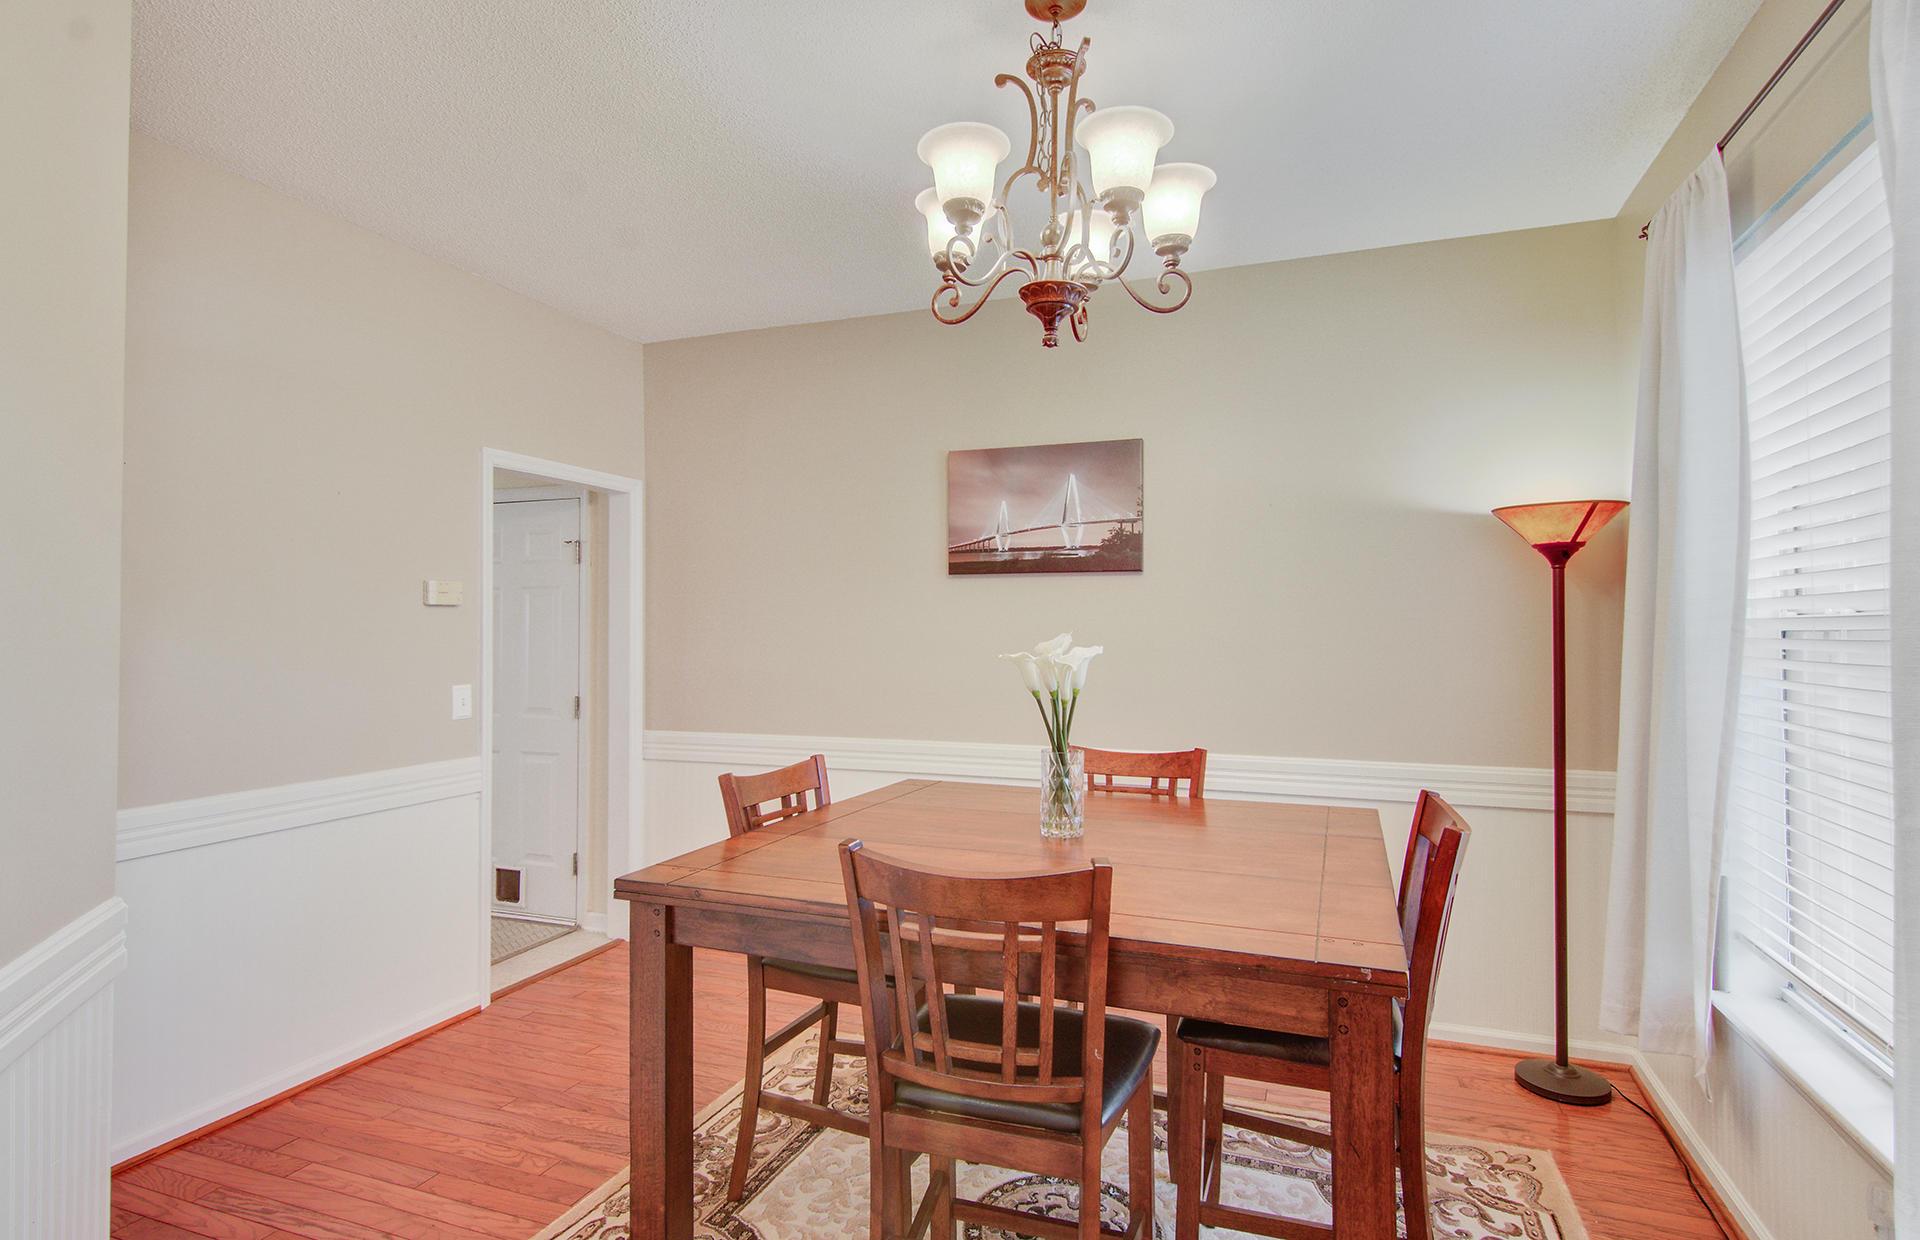 Belle Hall Homes For Sale - 192 Revolution, Mount Pleasant, SC - 12